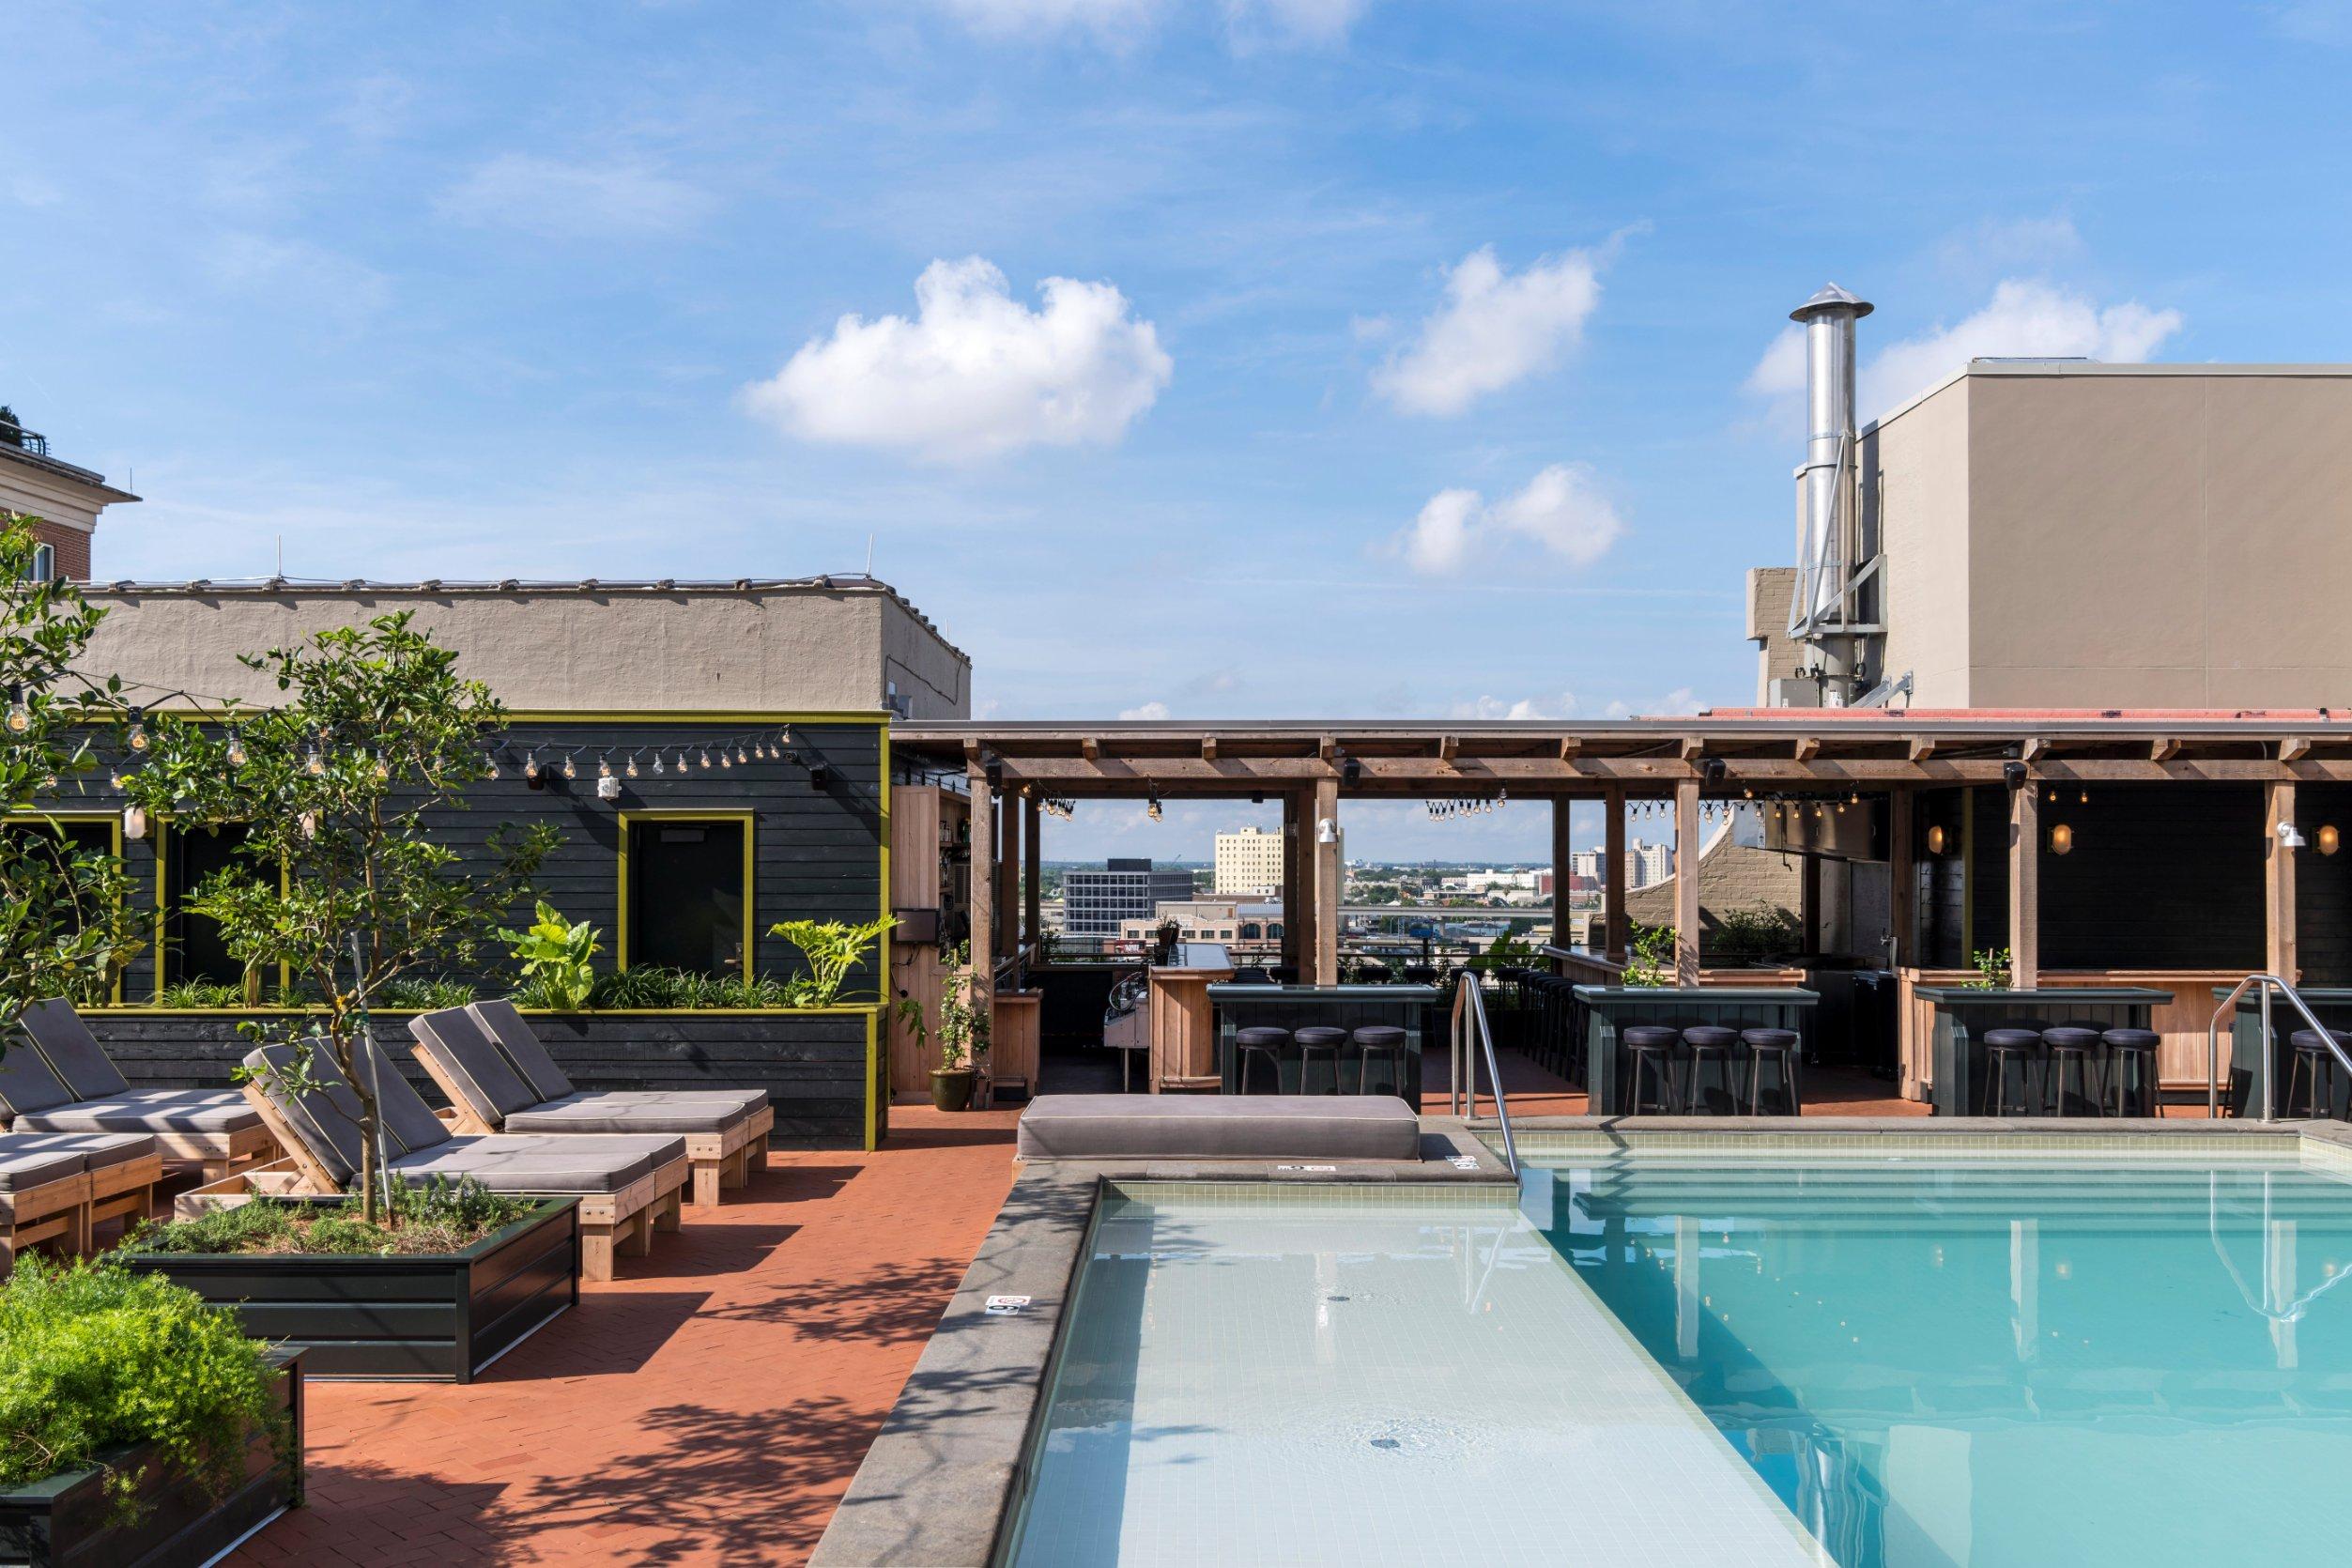 New Orleans Best Rooftop Bars Cnn Travel